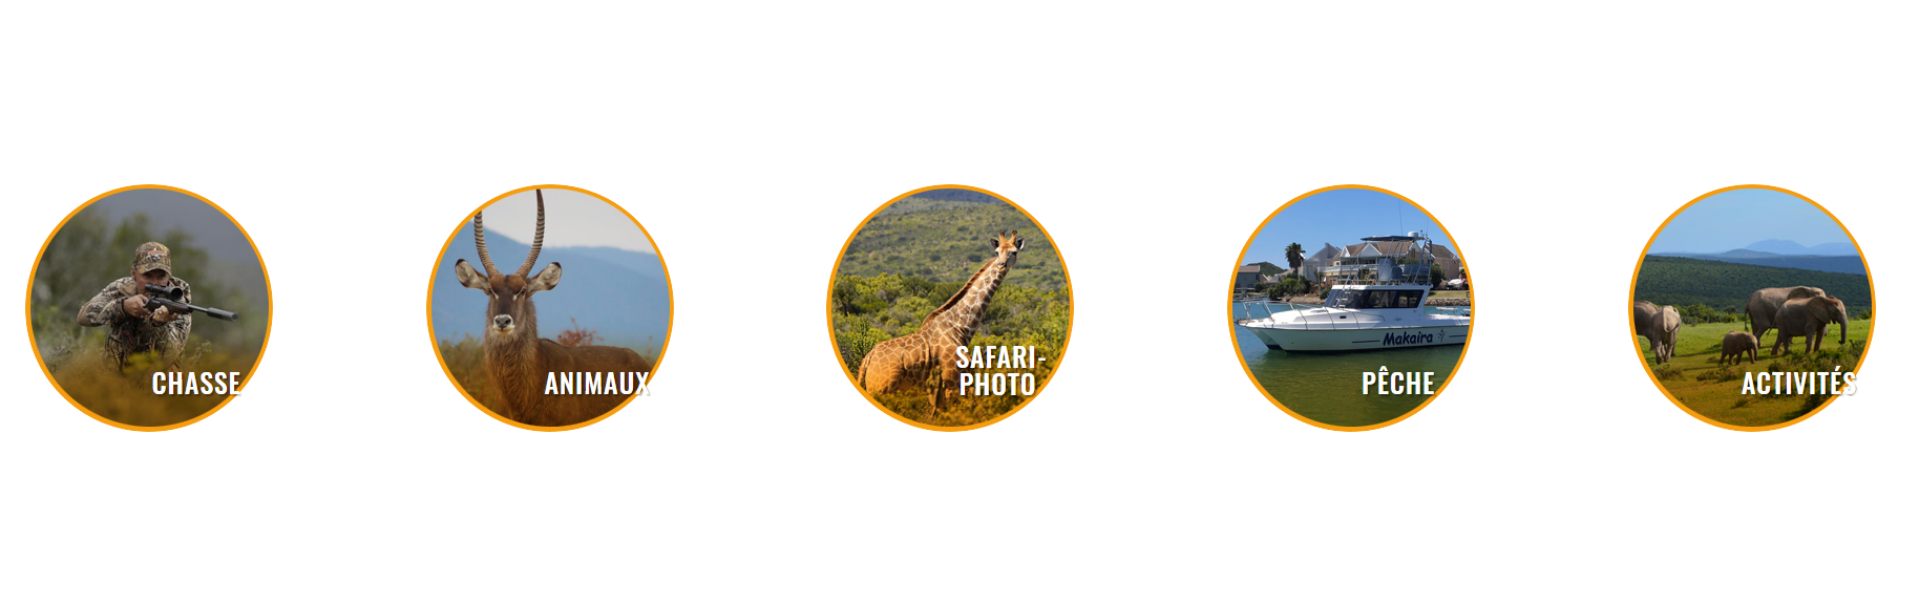 majeje africa safari